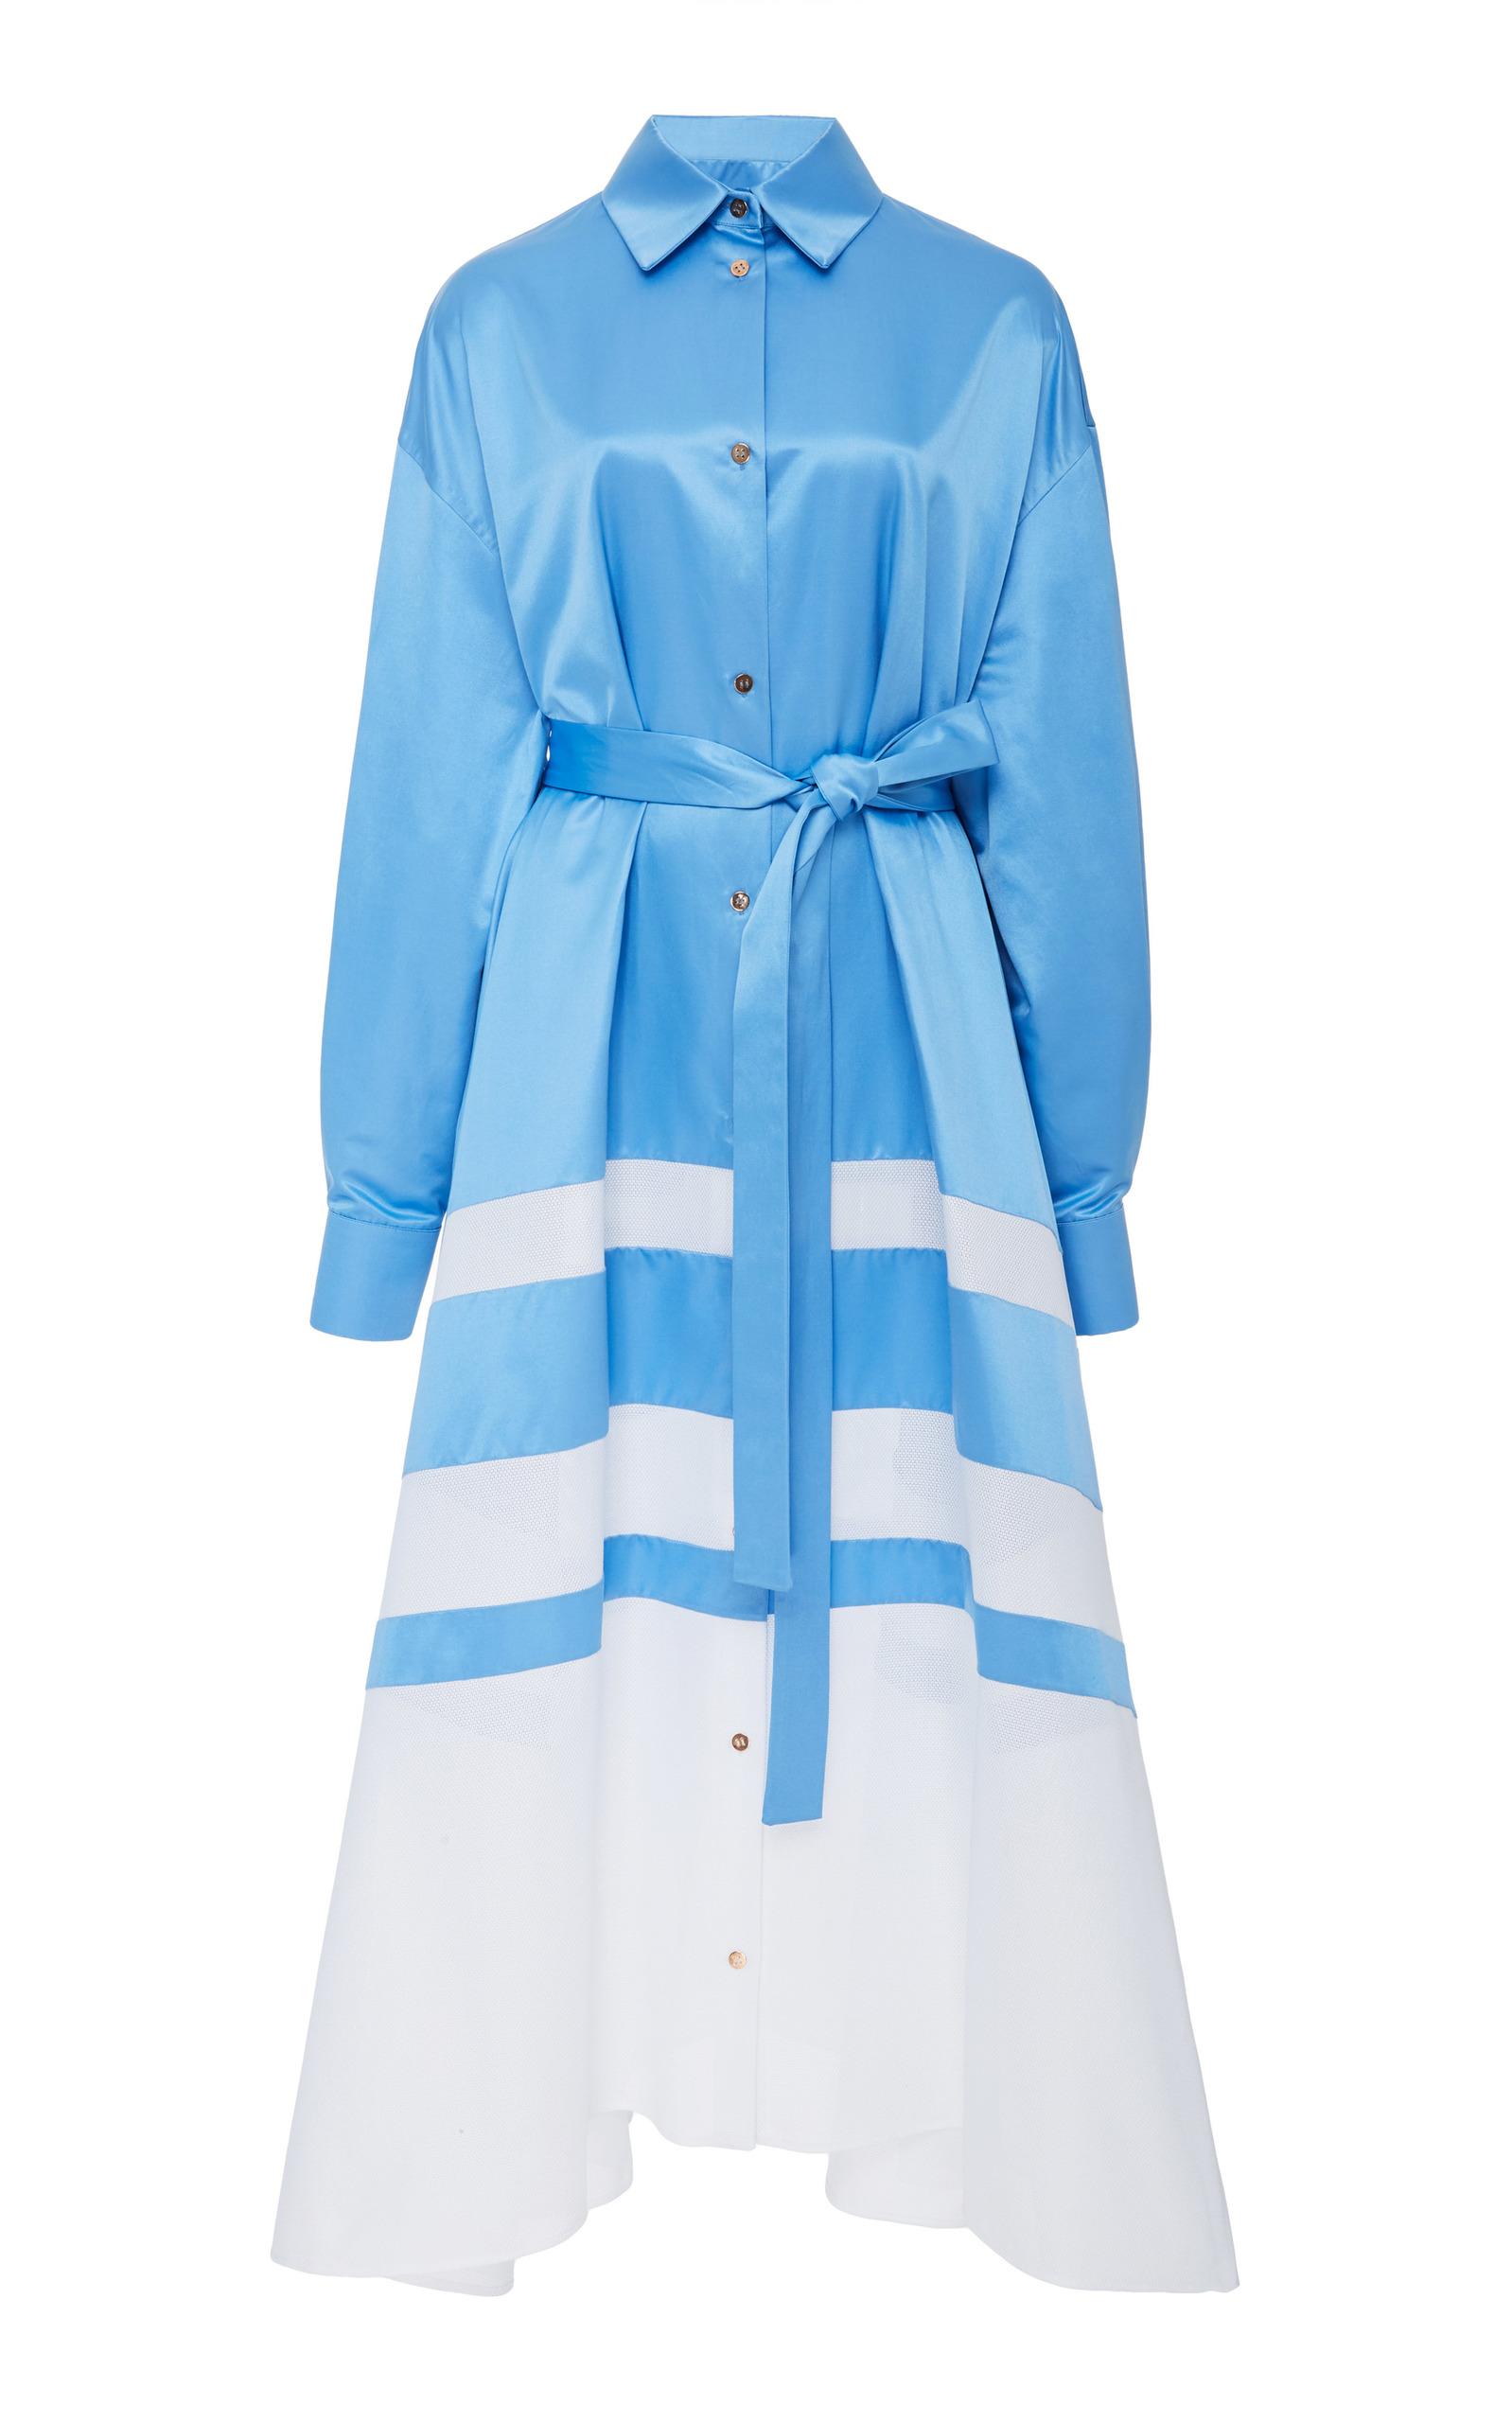 ESME VIE M'O EXCLUSIVE PORTOFINO DRESS